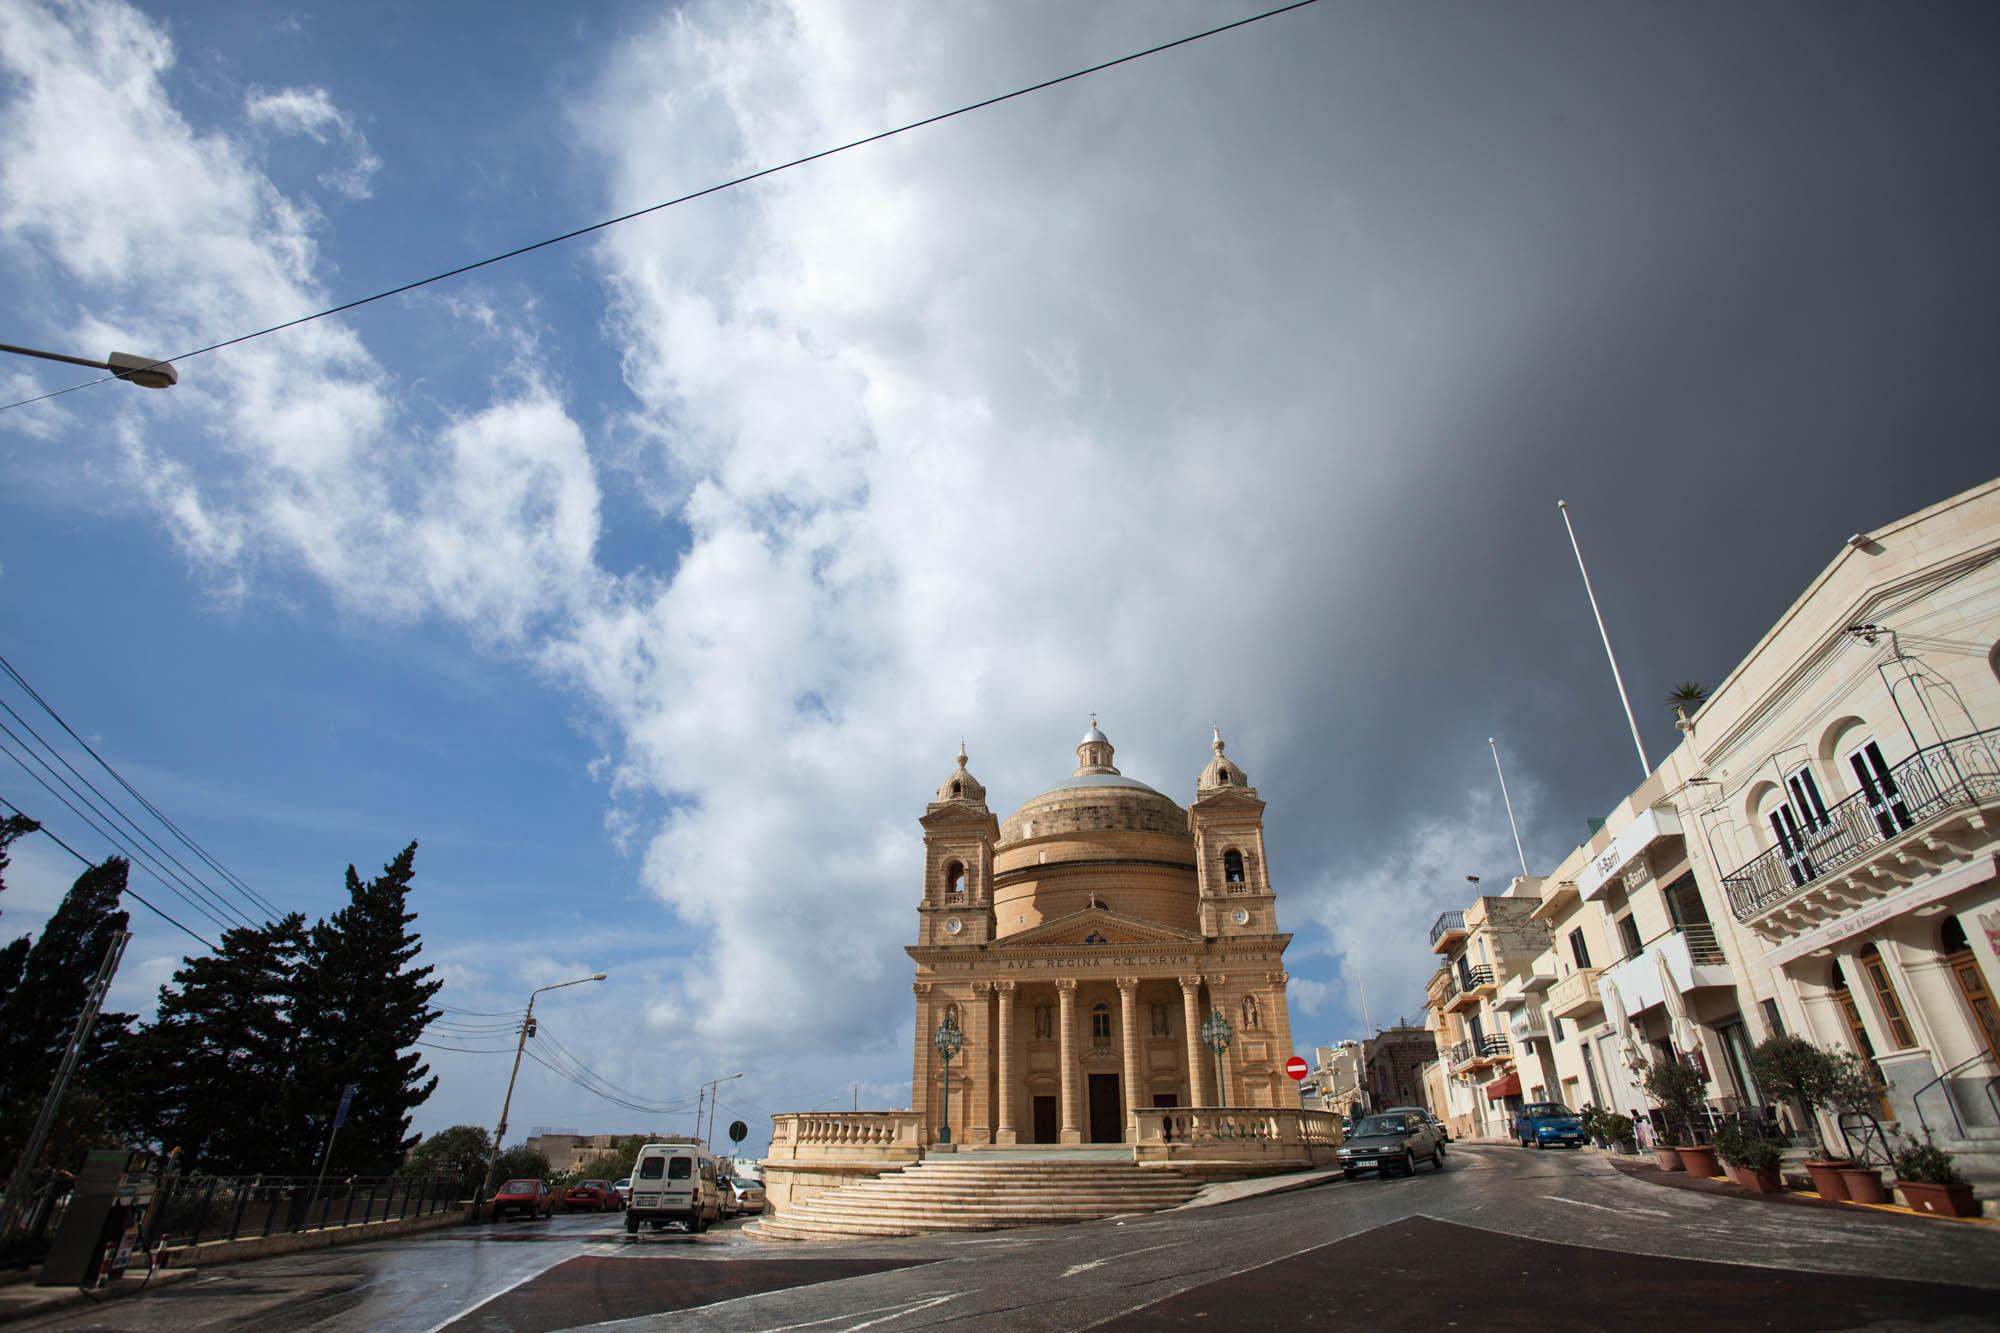 Malta / Travel Photography